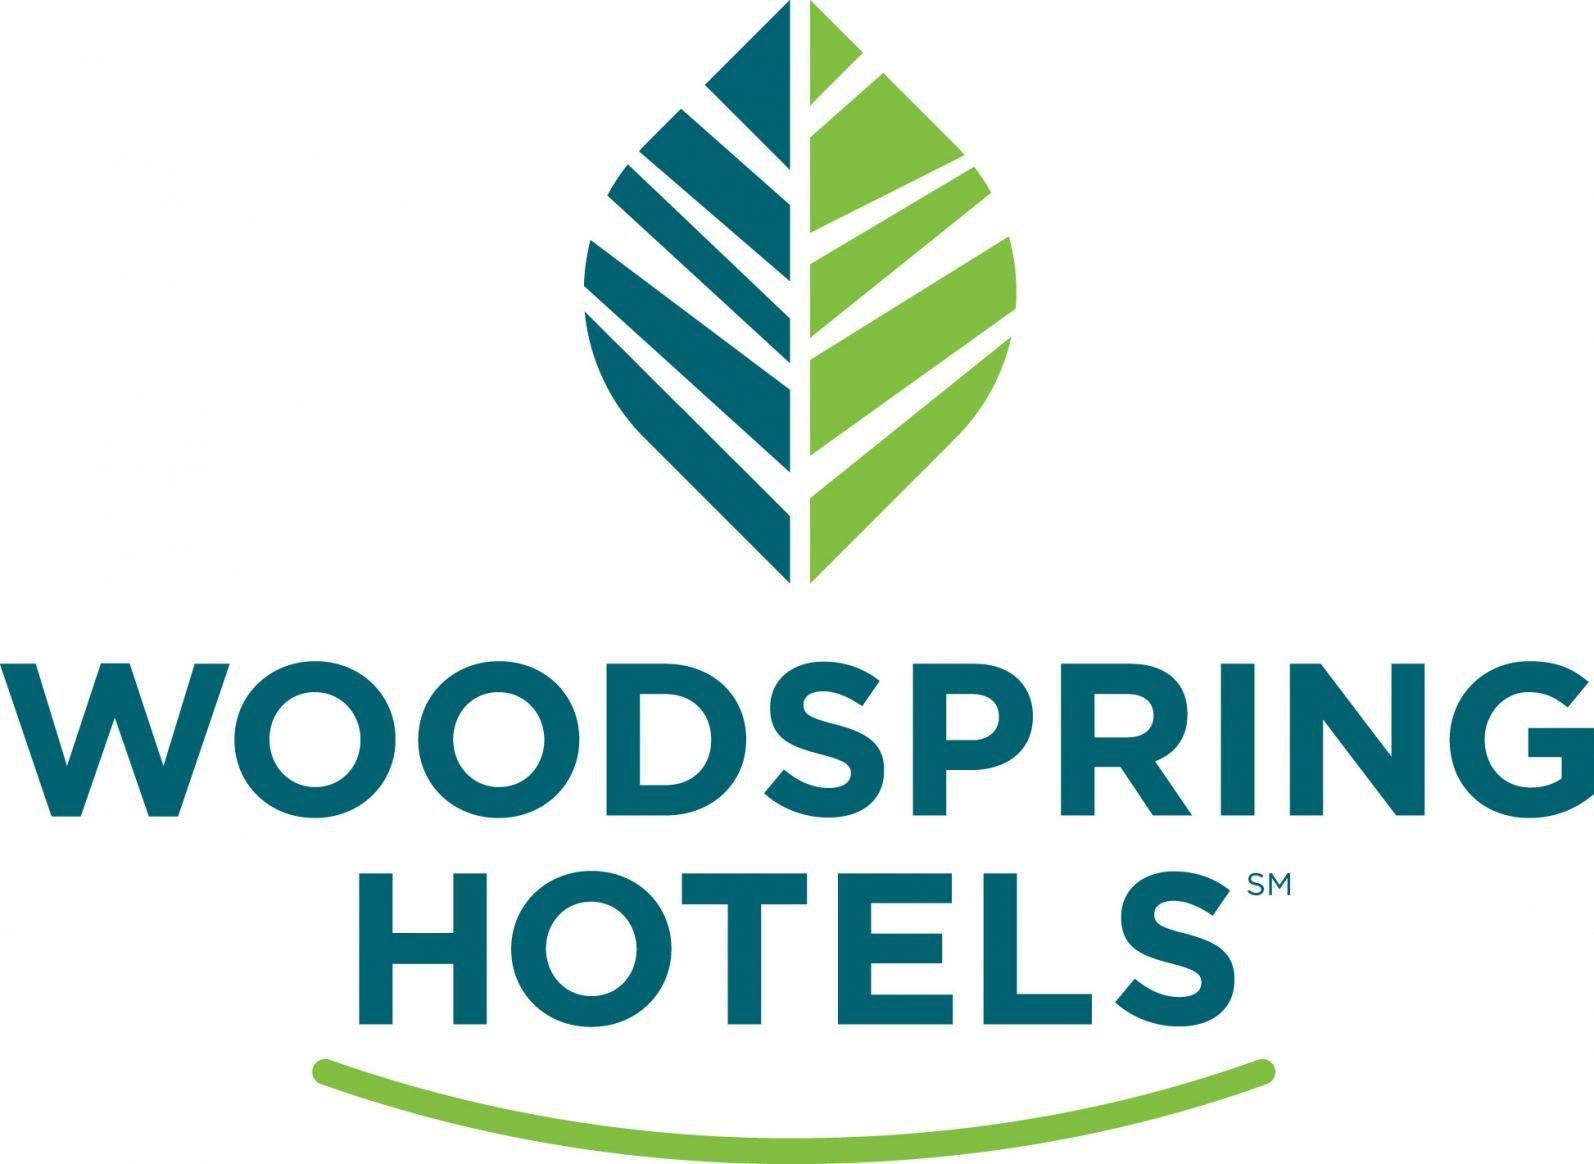 WoodSpring Hotels Enters Seattle Market with WoodSpring Suites Seattle Everett